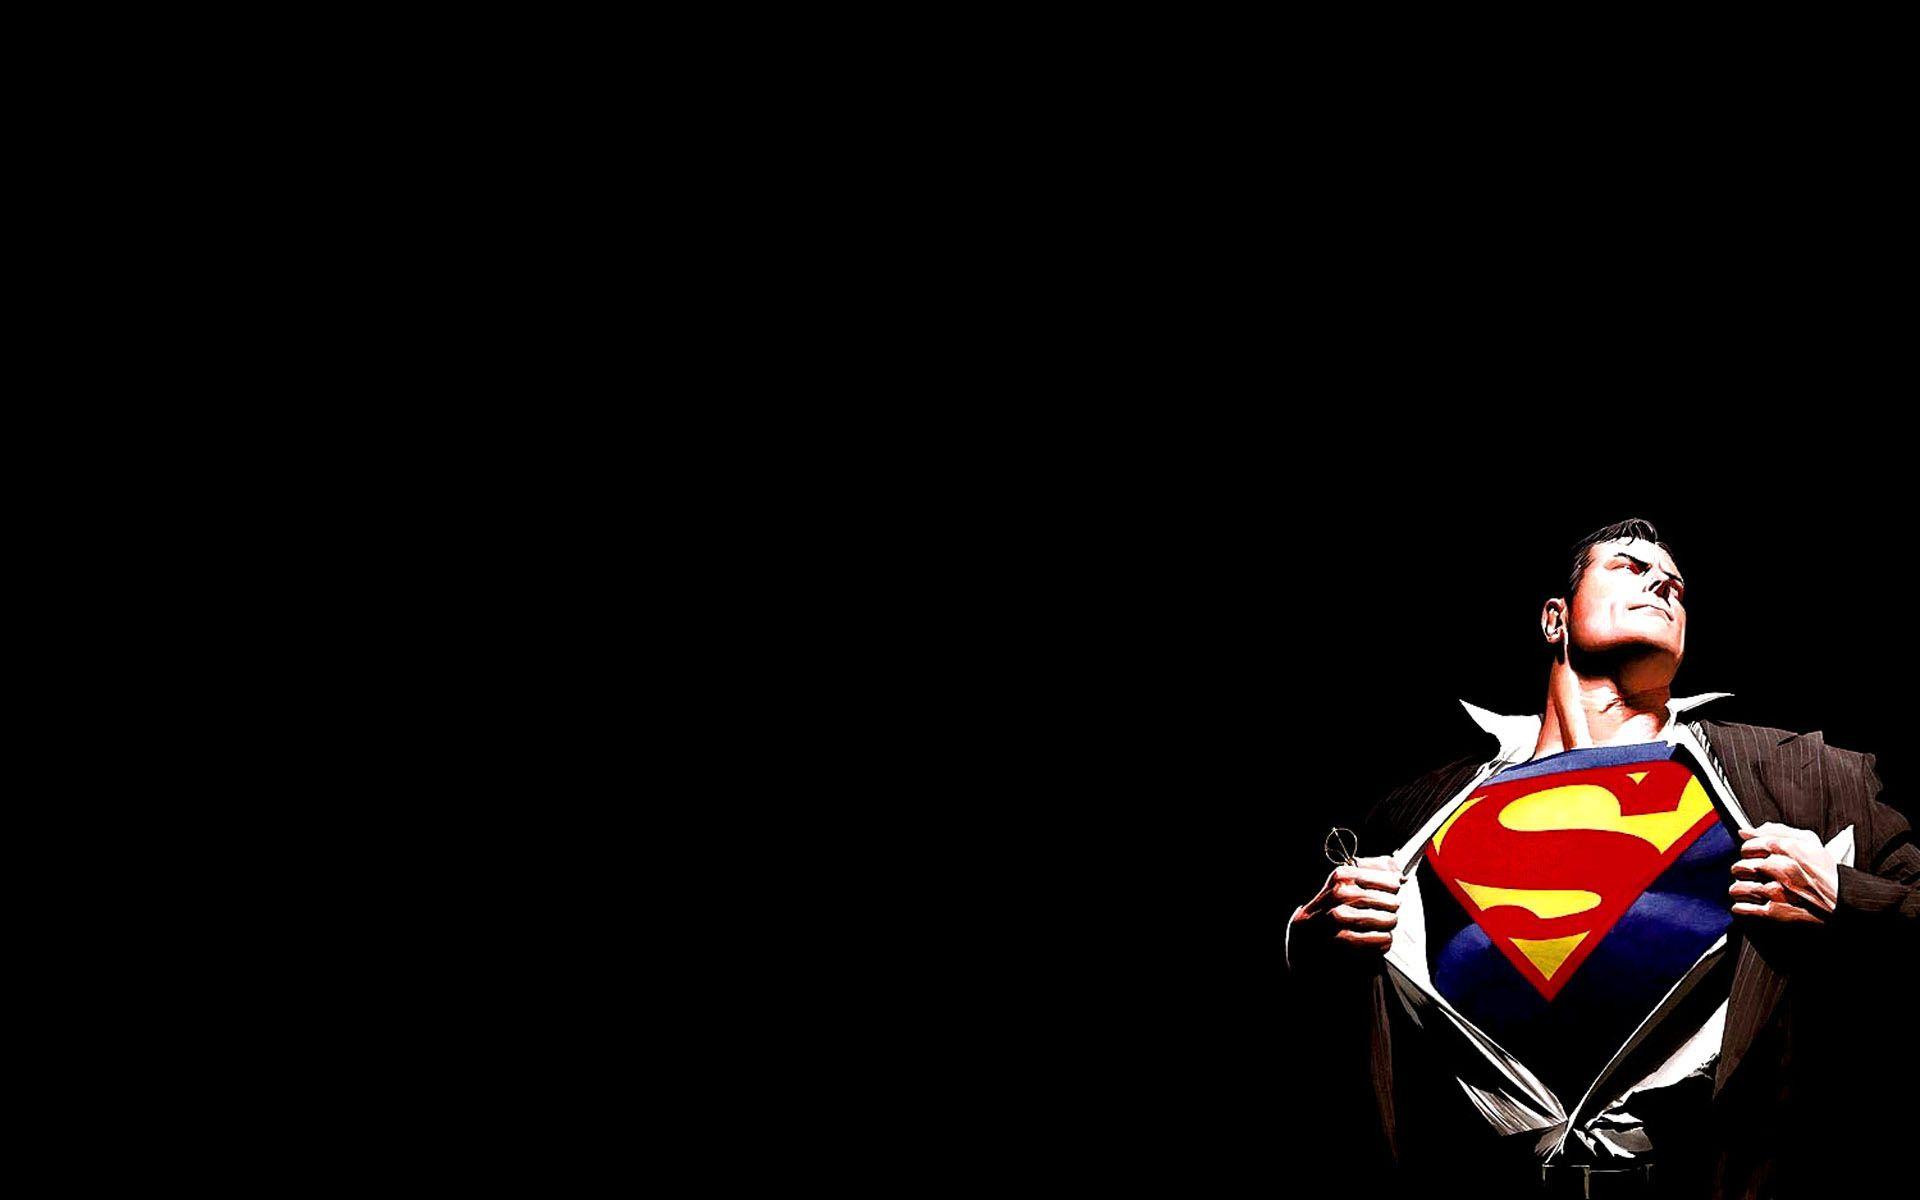 Superman Background Images